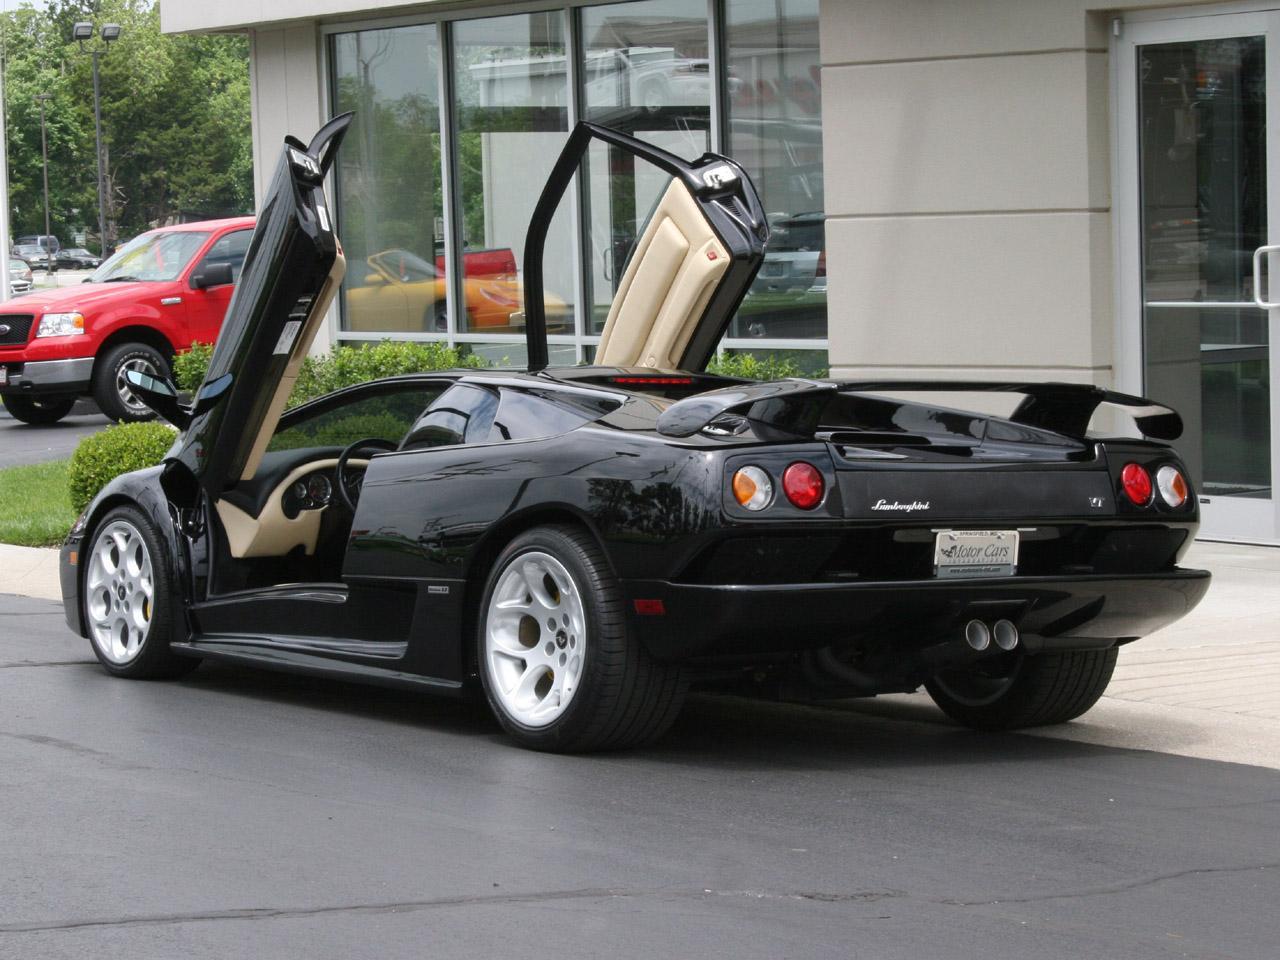 2001 Lamborghini Diablo Image 12